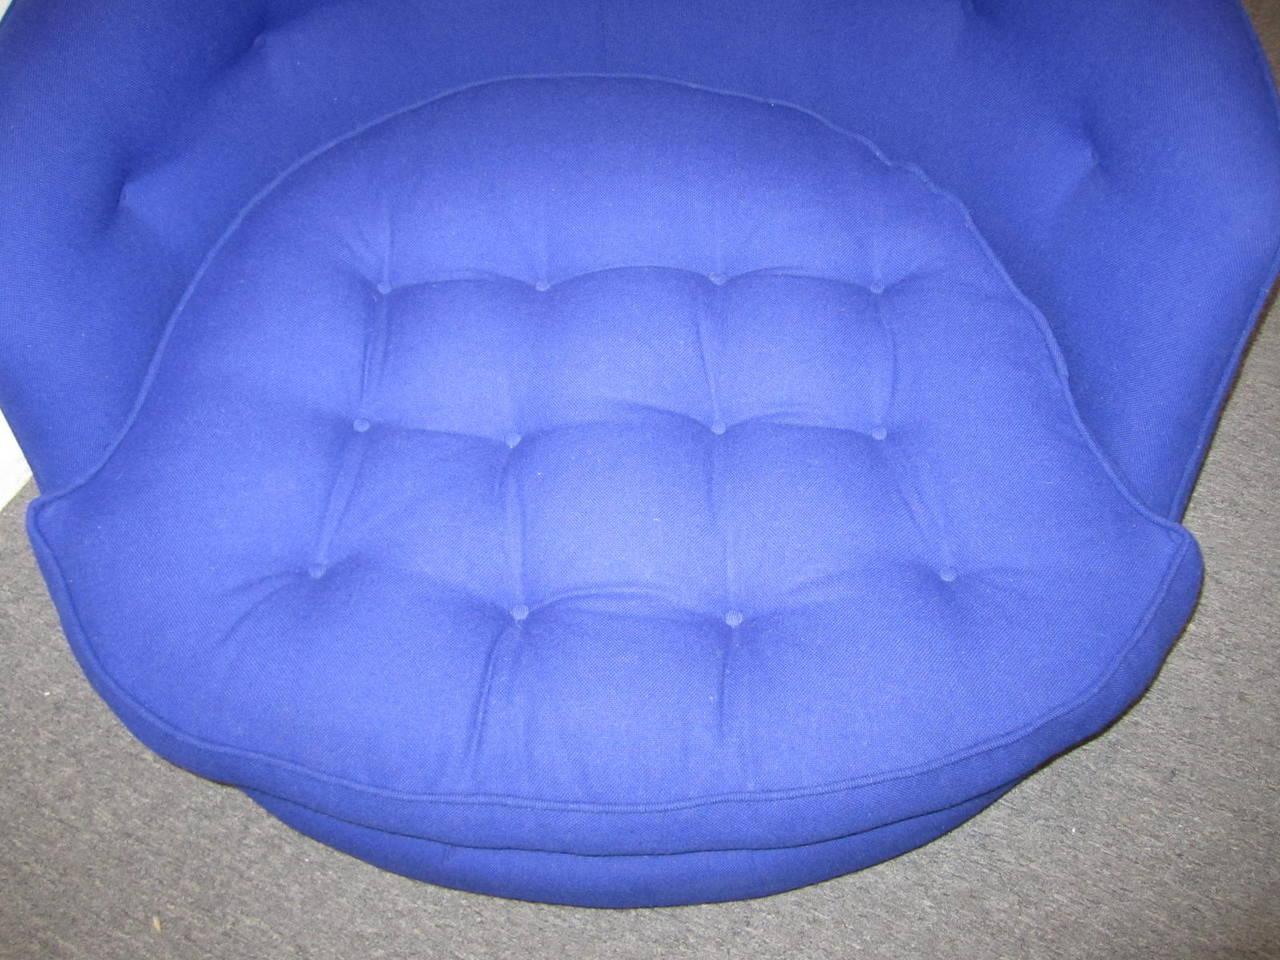 Fabulous Oversized Round Circular Milo Baughman Swivel